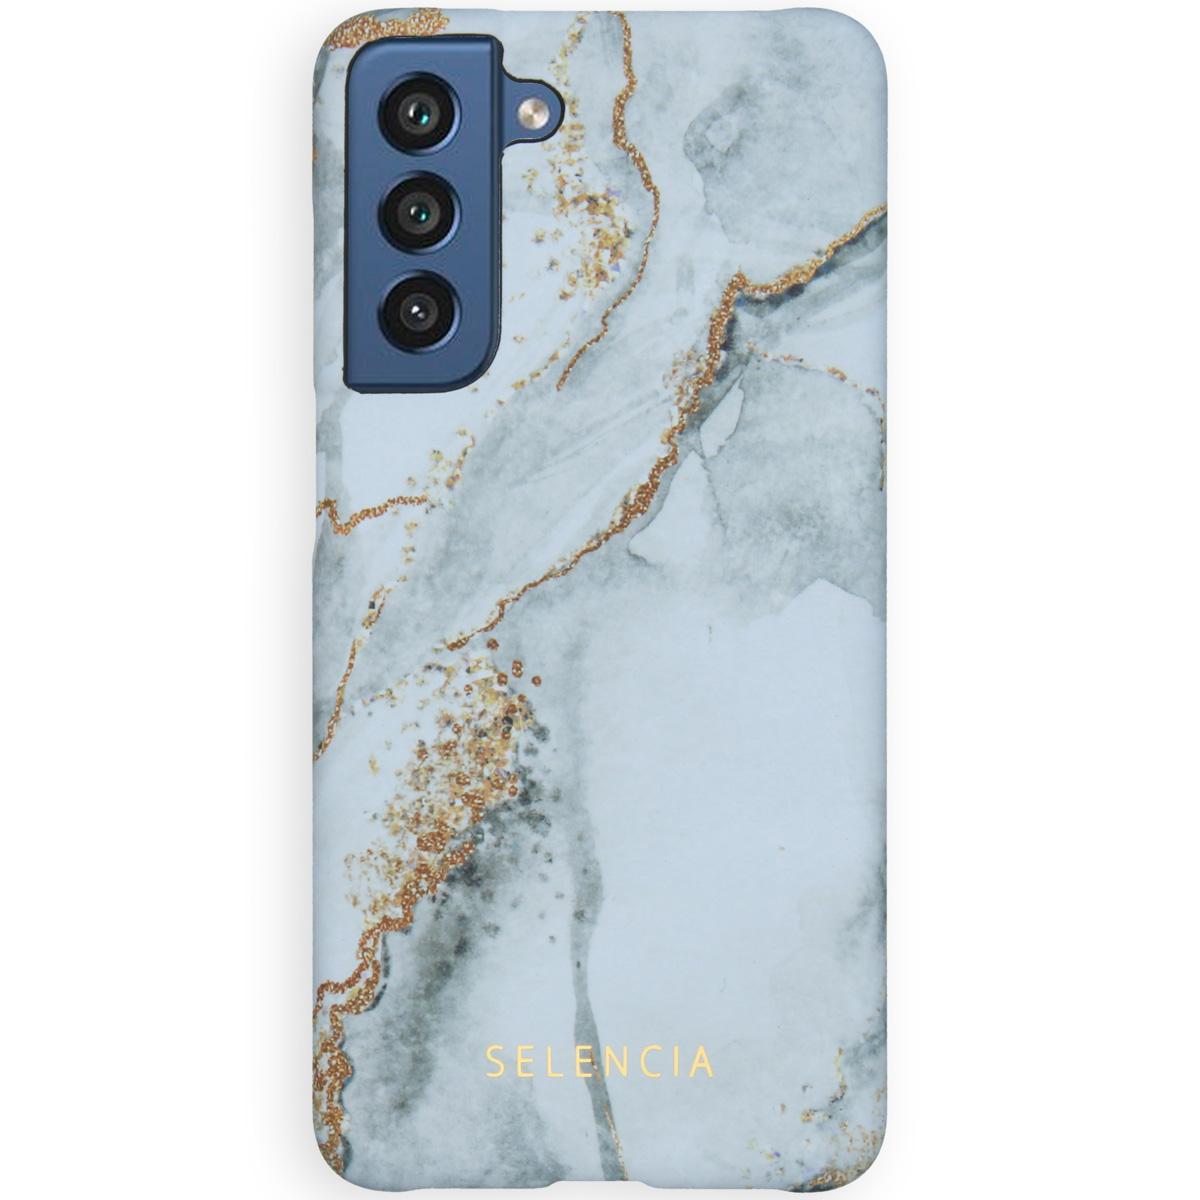 Selencia Maya Fashion Backcover Samsung Galaxy S21 FE - Marble Stone